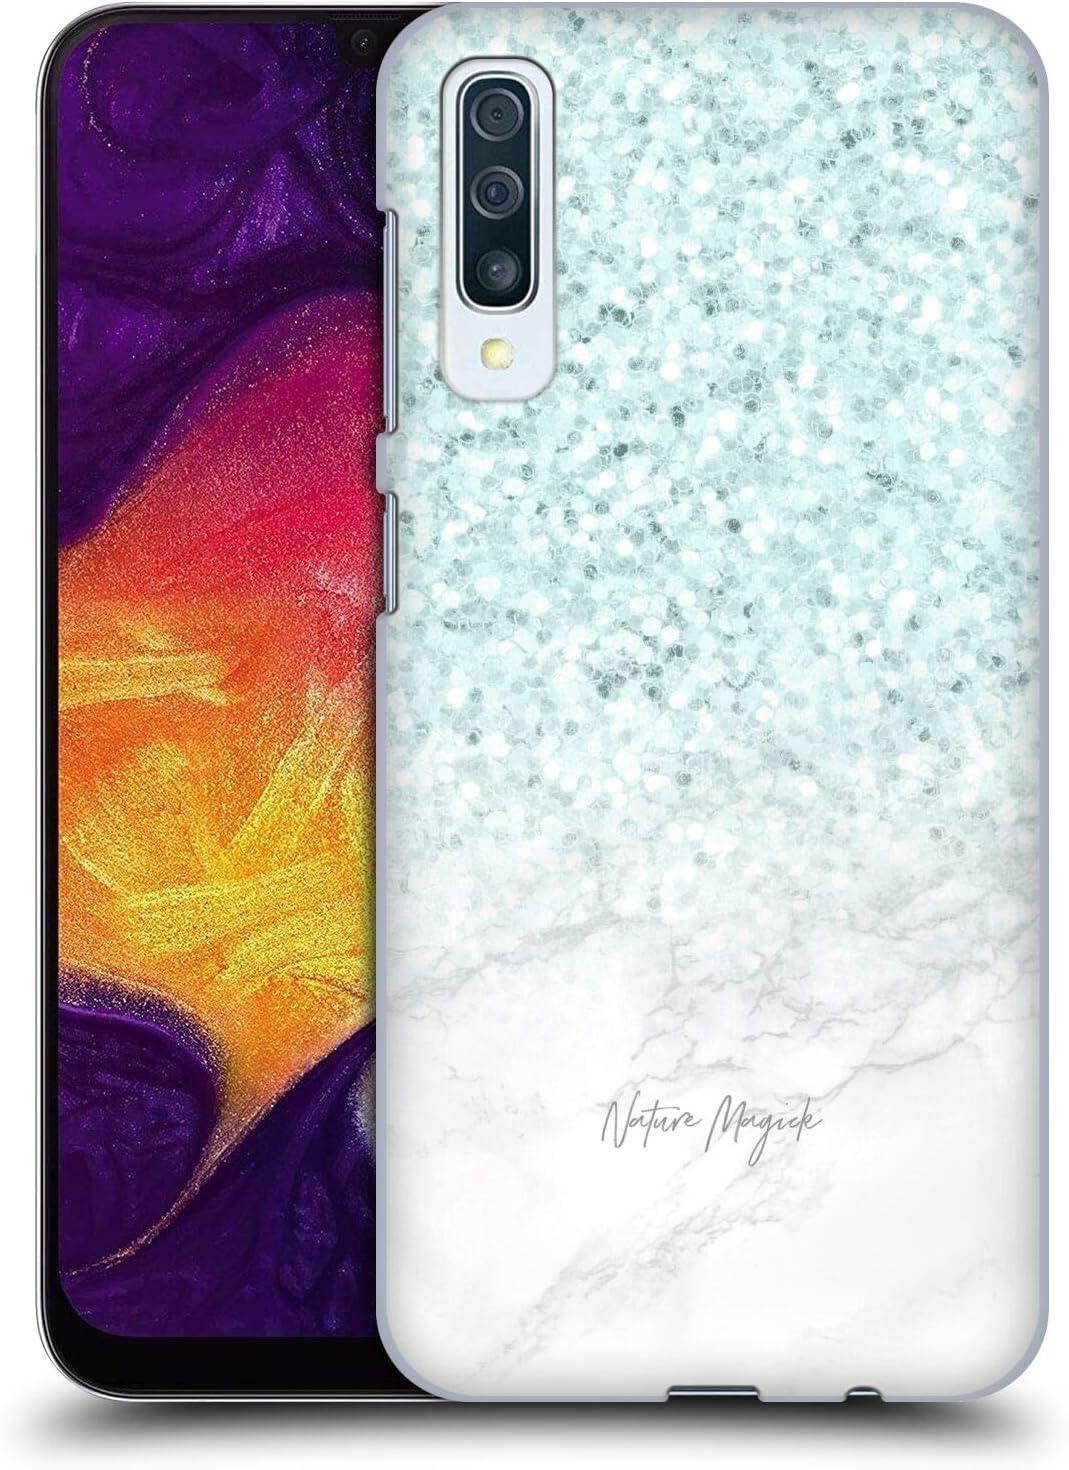 Head Case Designs Oficial Nature Magick Turquesa Turquesa Chispa M/ármol con Purpurina Pastel Carcasa r/ígida Compatible con Samsung Galaxy S20 S20 5G